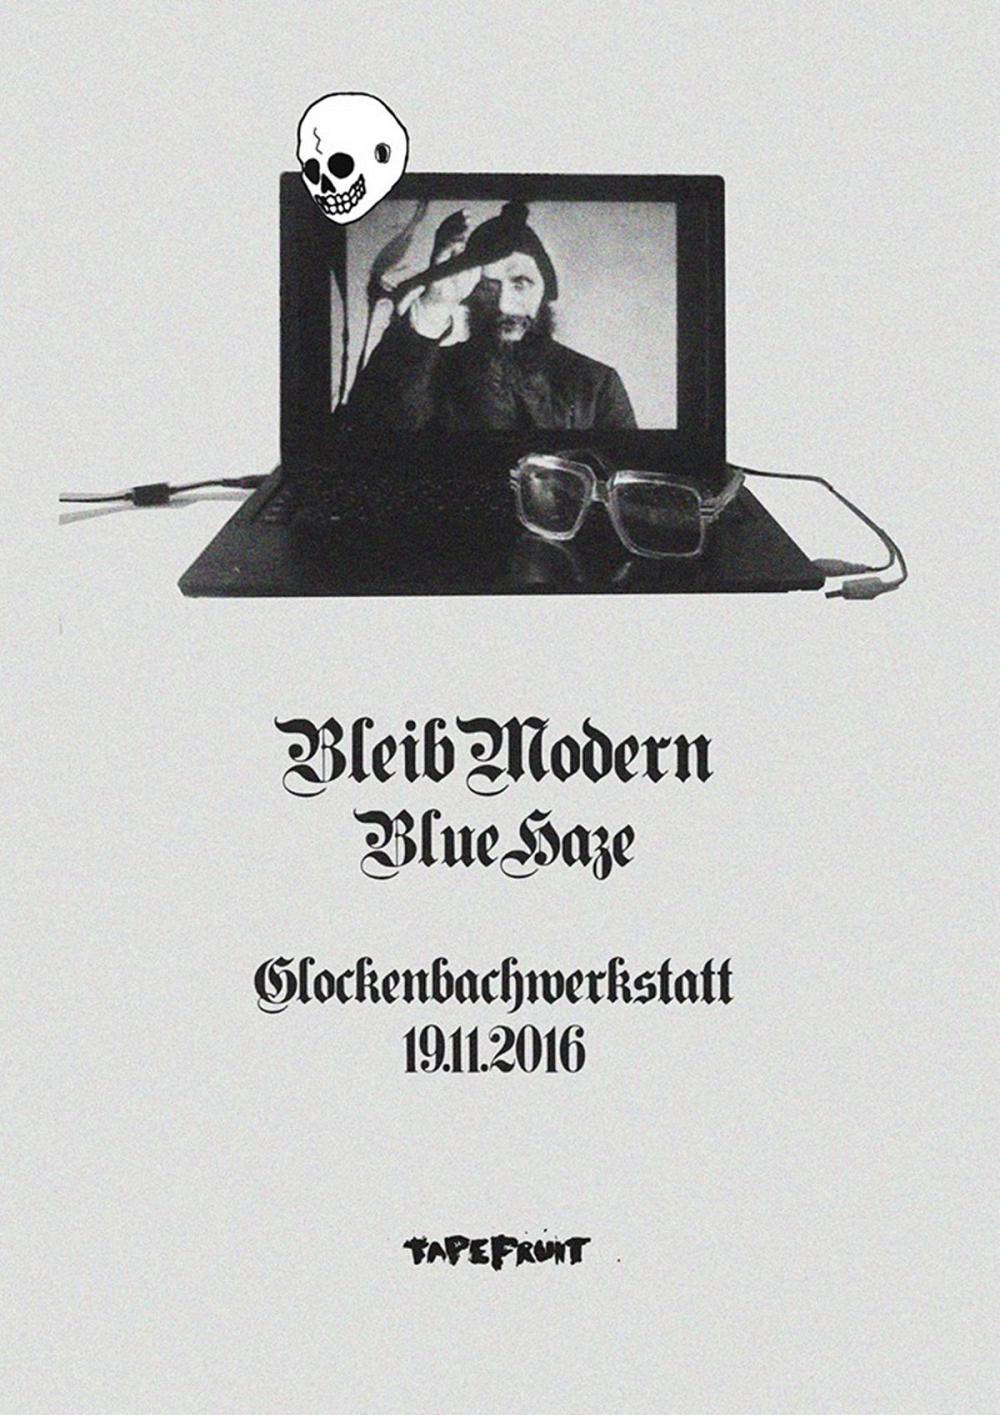 Tapefruit Konzert: Bleib Modern + Blue Haze | 19.11.2016 @ Glockenbachwerkstatt